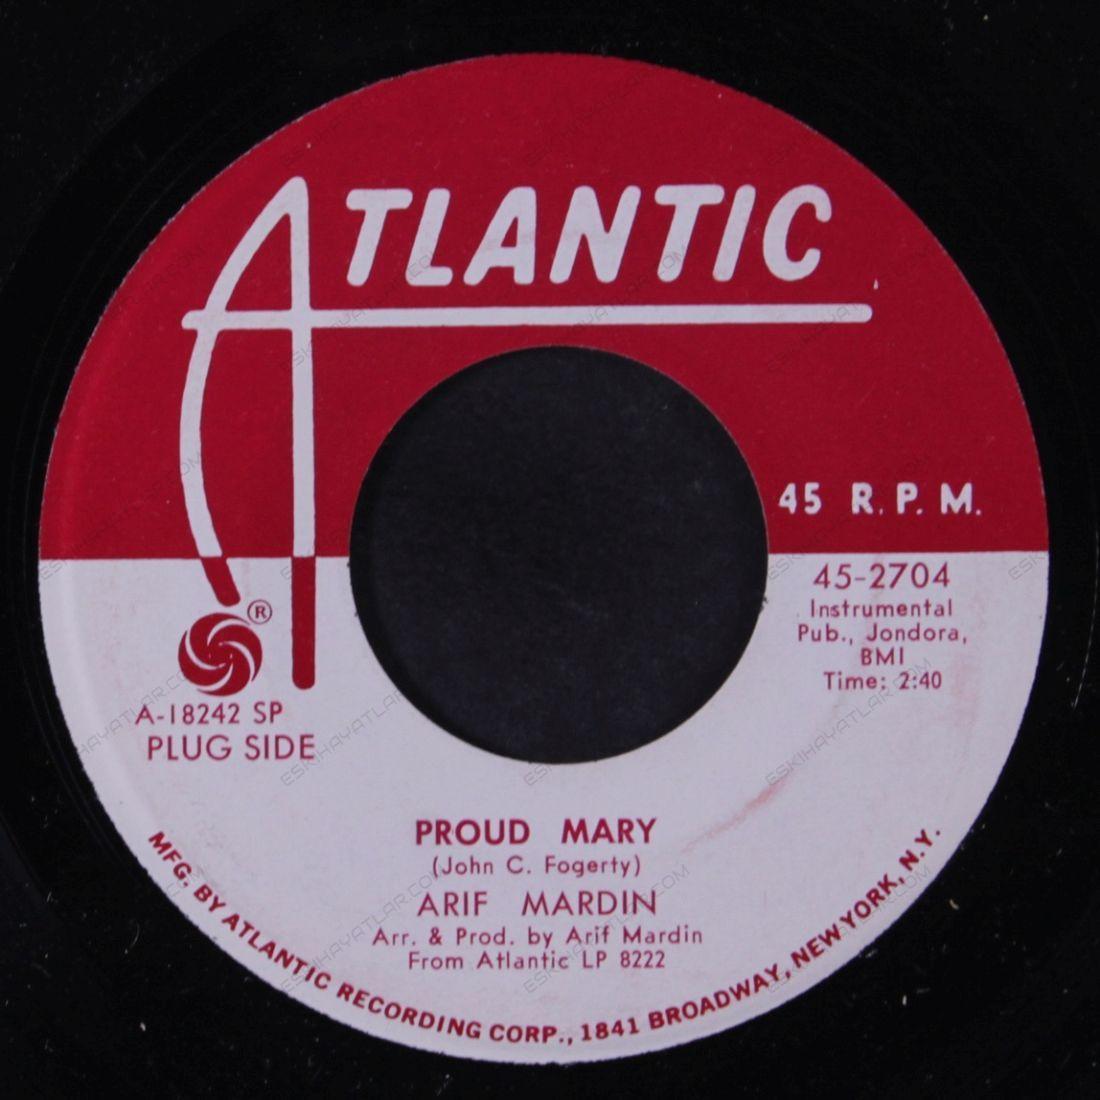 0261-arif-mardin-kimdir-arif-mardin-produktorlugu-amerikan-pop-muzigin-turk-produktoru-atlantic-records-ebul-ula-mardin (5)